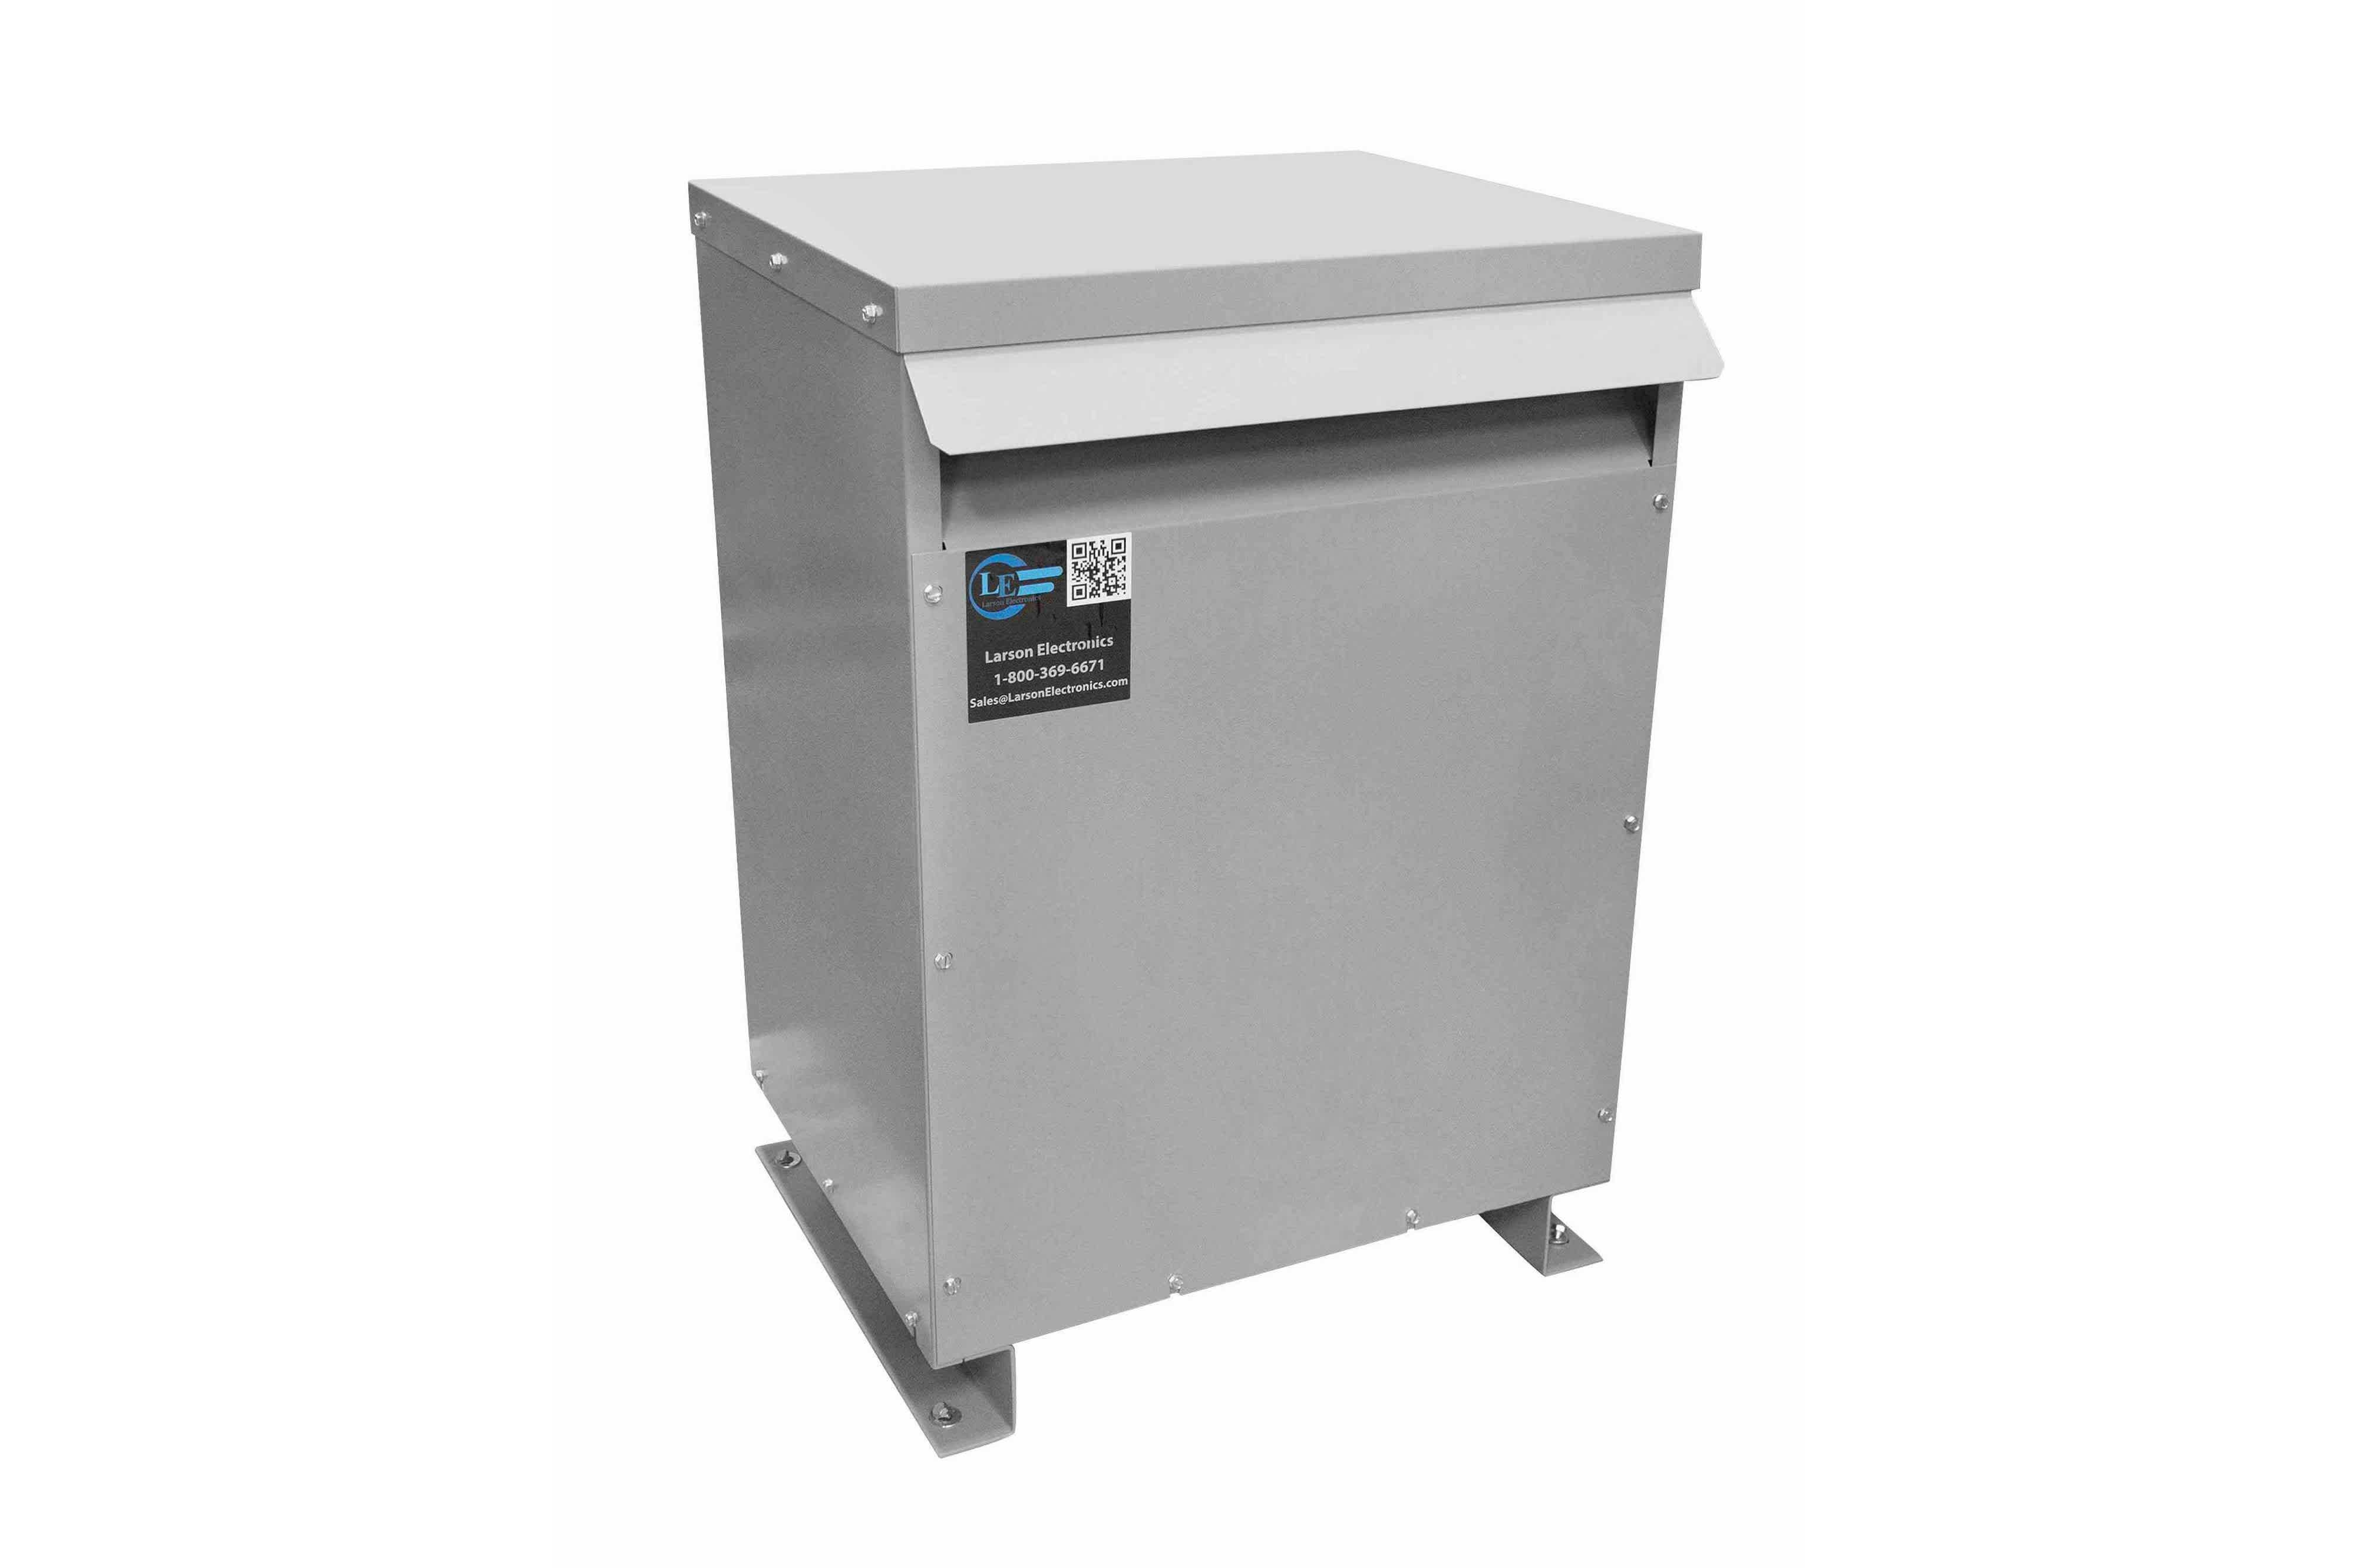 32.5 kVA 3PH Isolation Transformer, 415V Wye Primary, 480Y/277 Wye-N Secondary, N3R, Ventilated, 60 Hz